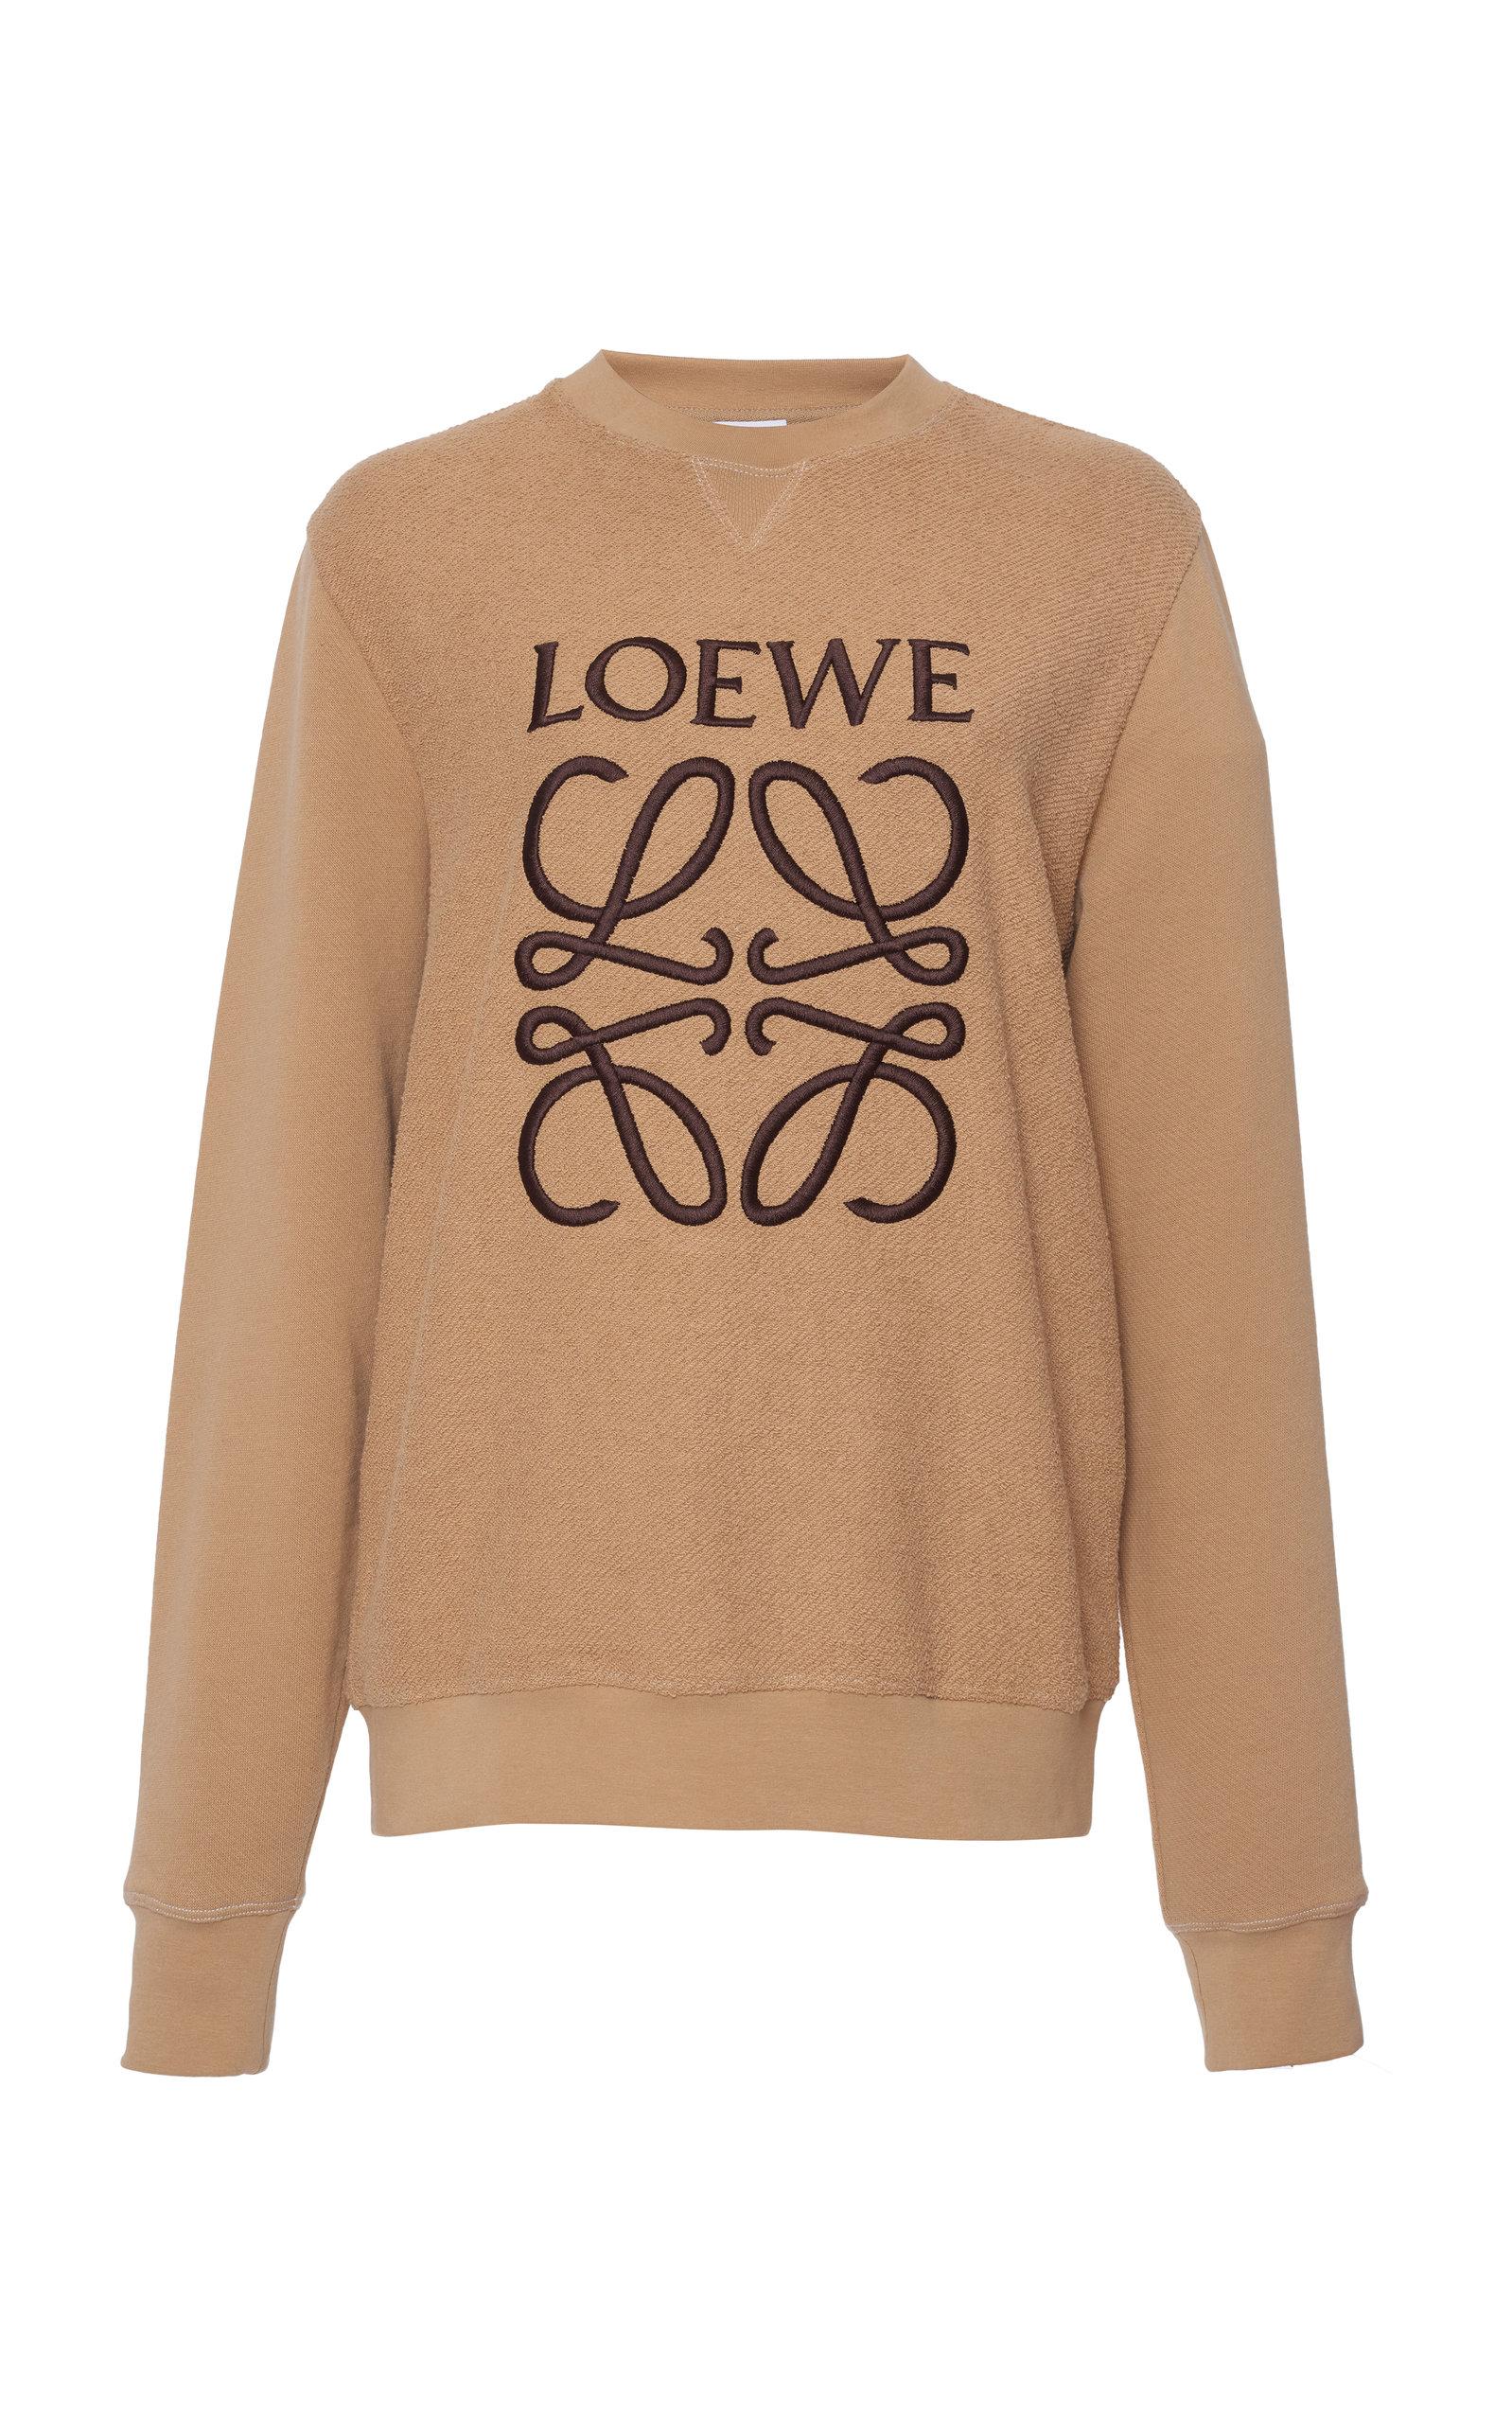 a5fd50018b9 Logo-Printed Cotton-Jersey Sweatshirt by Loewe | Moda Operandi